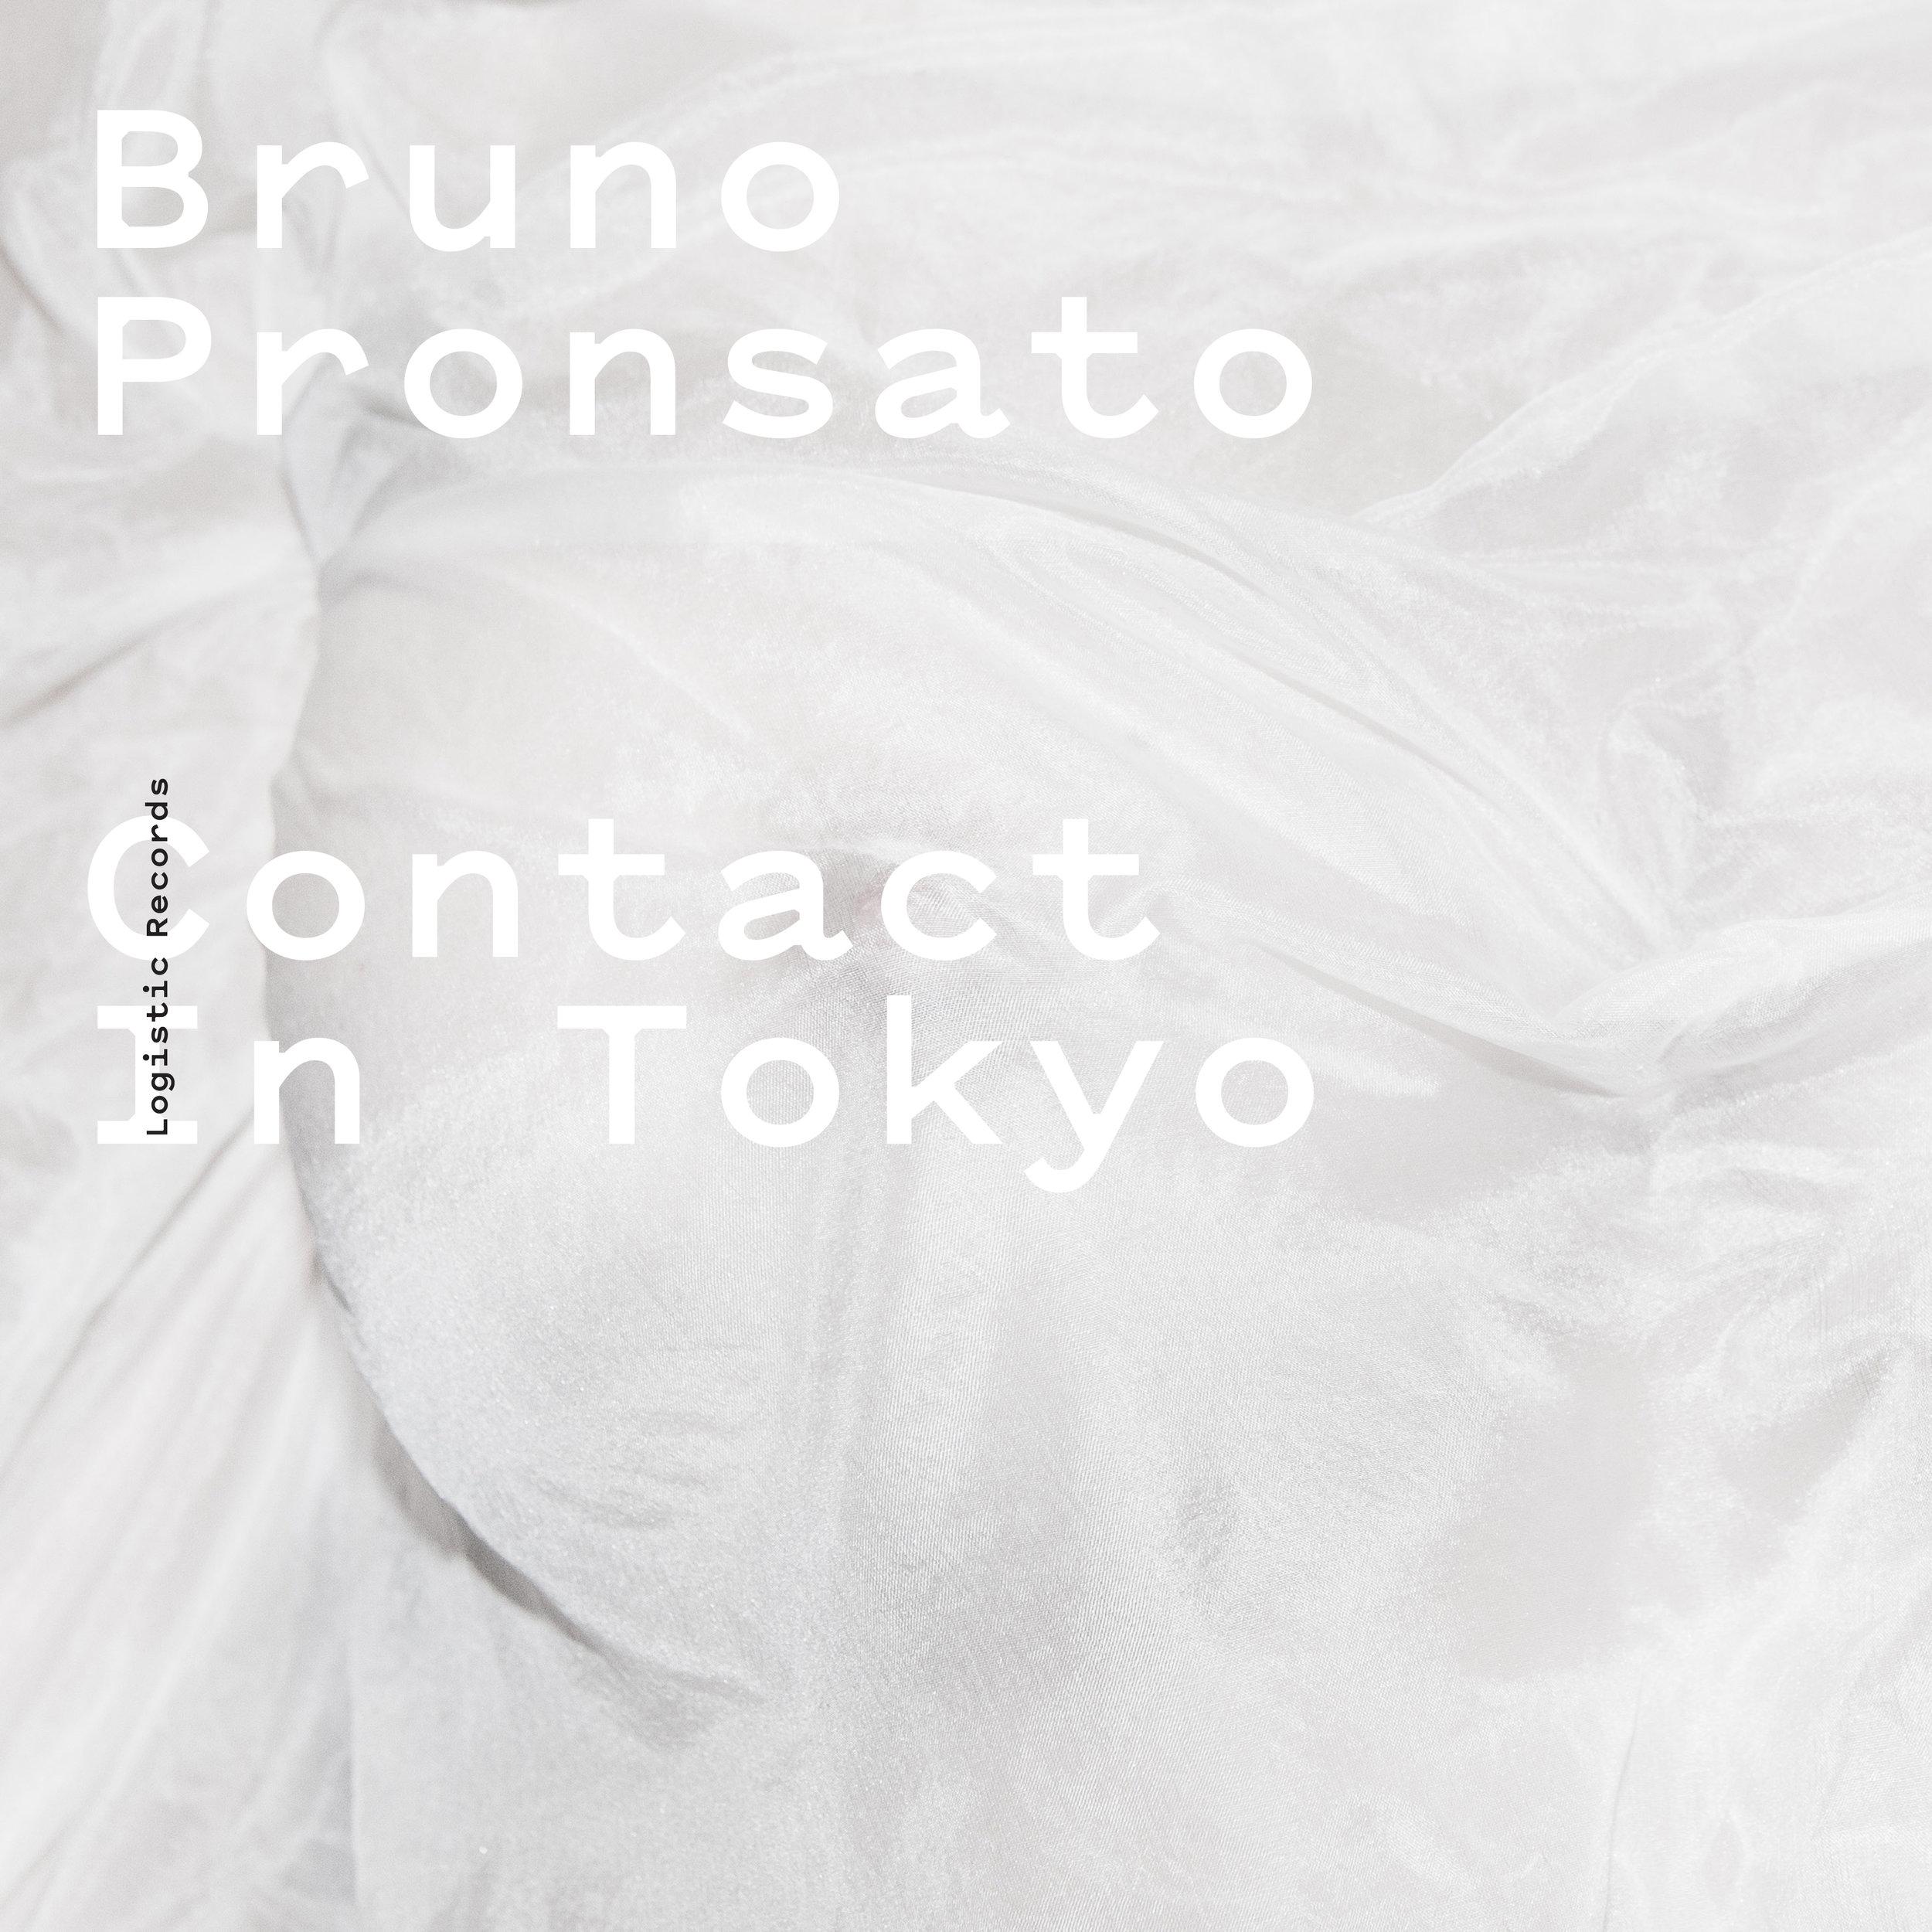 Contact in Tokyo_PROMO-ARTWORK-1.jpg